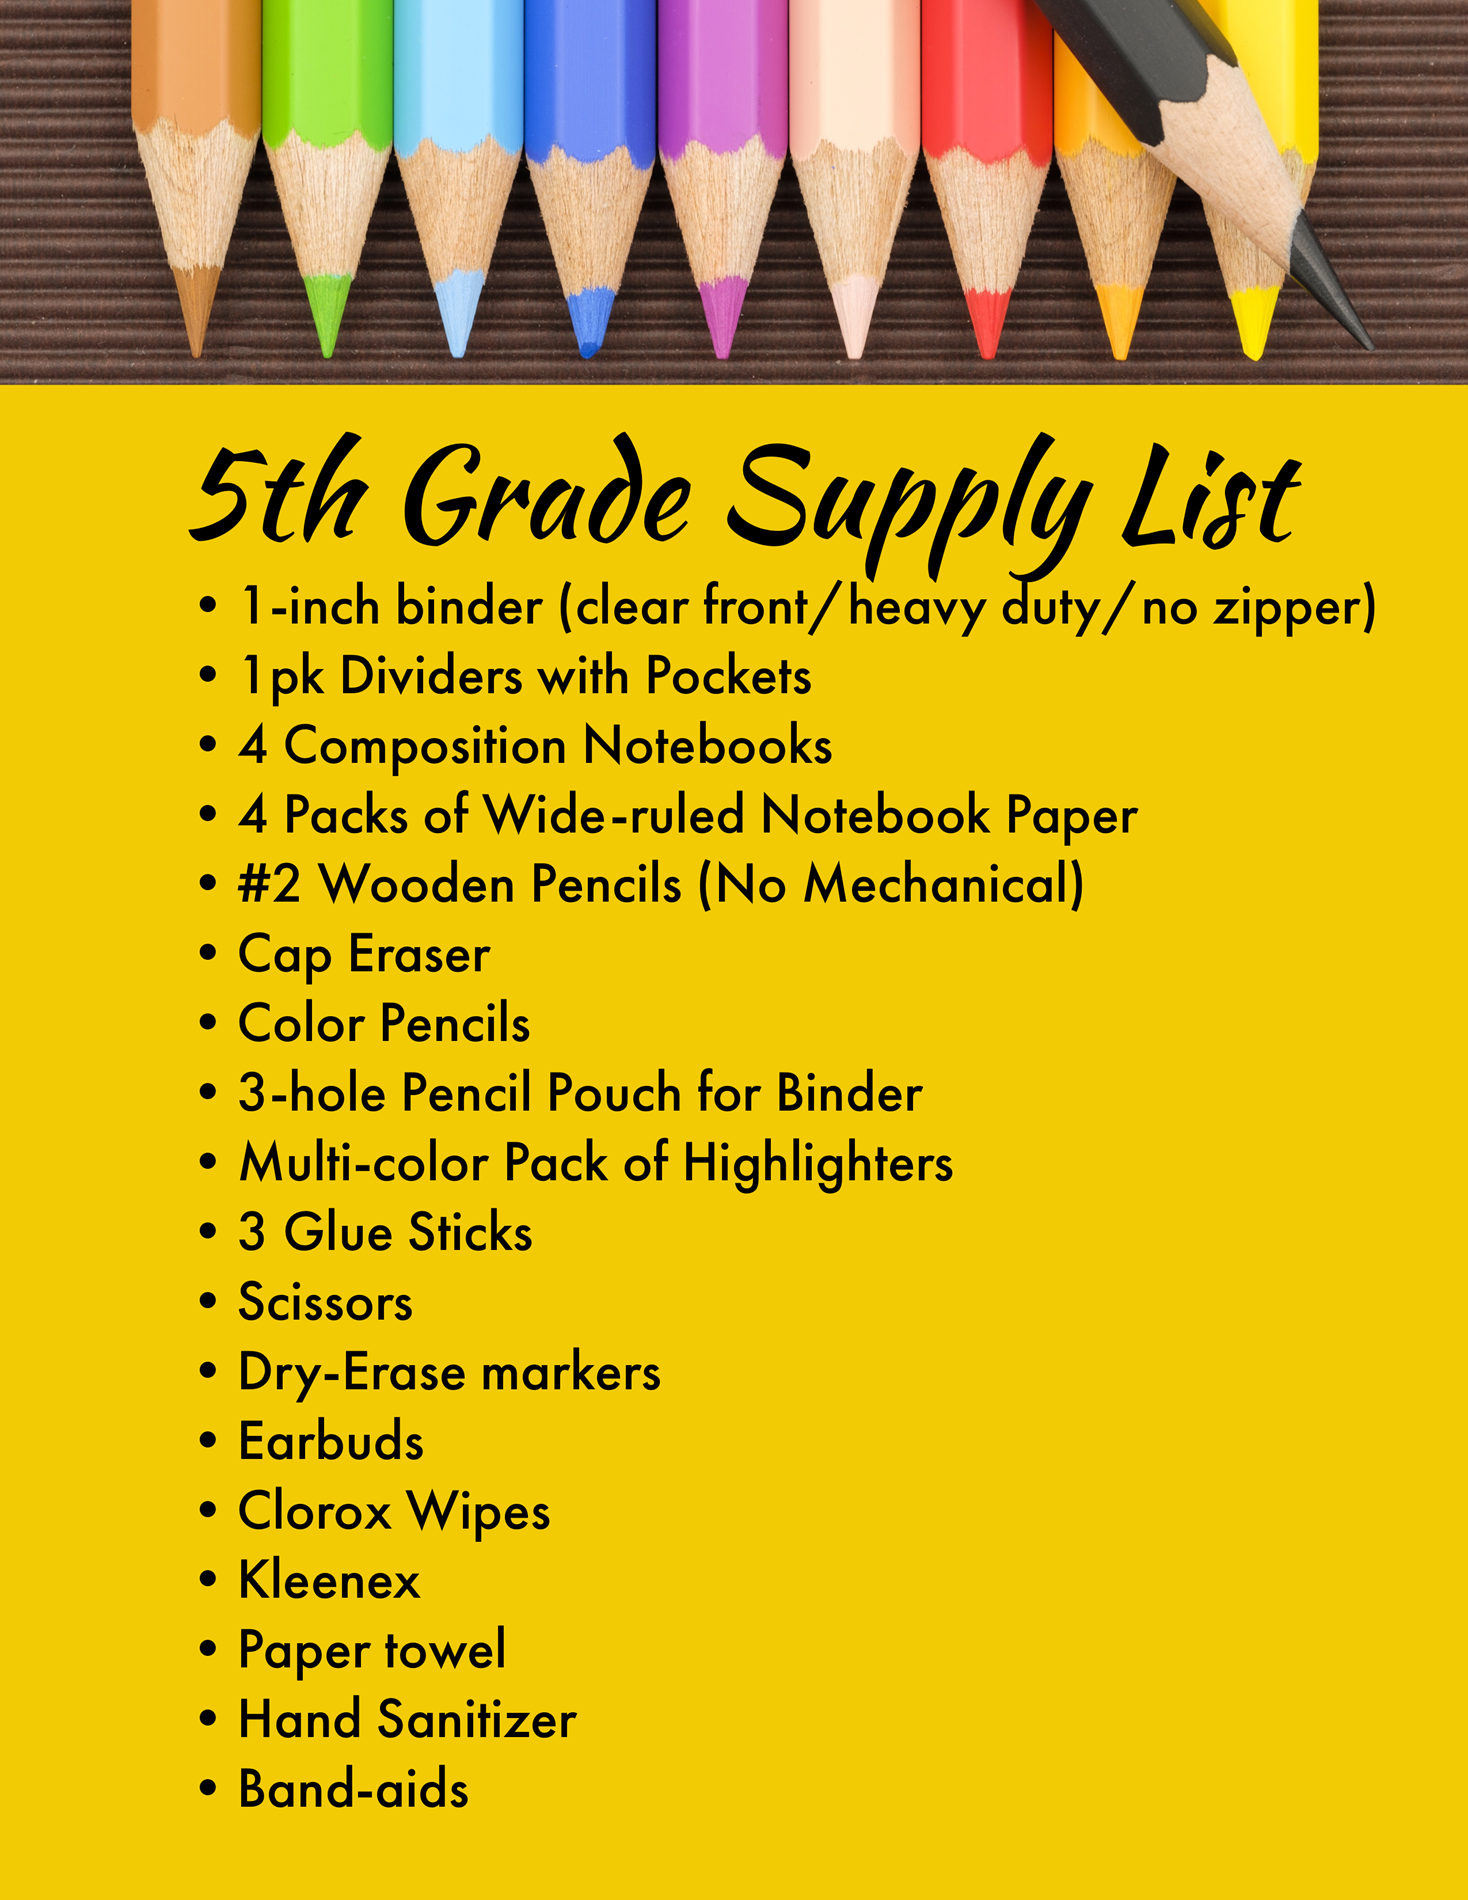 5th grade supplies